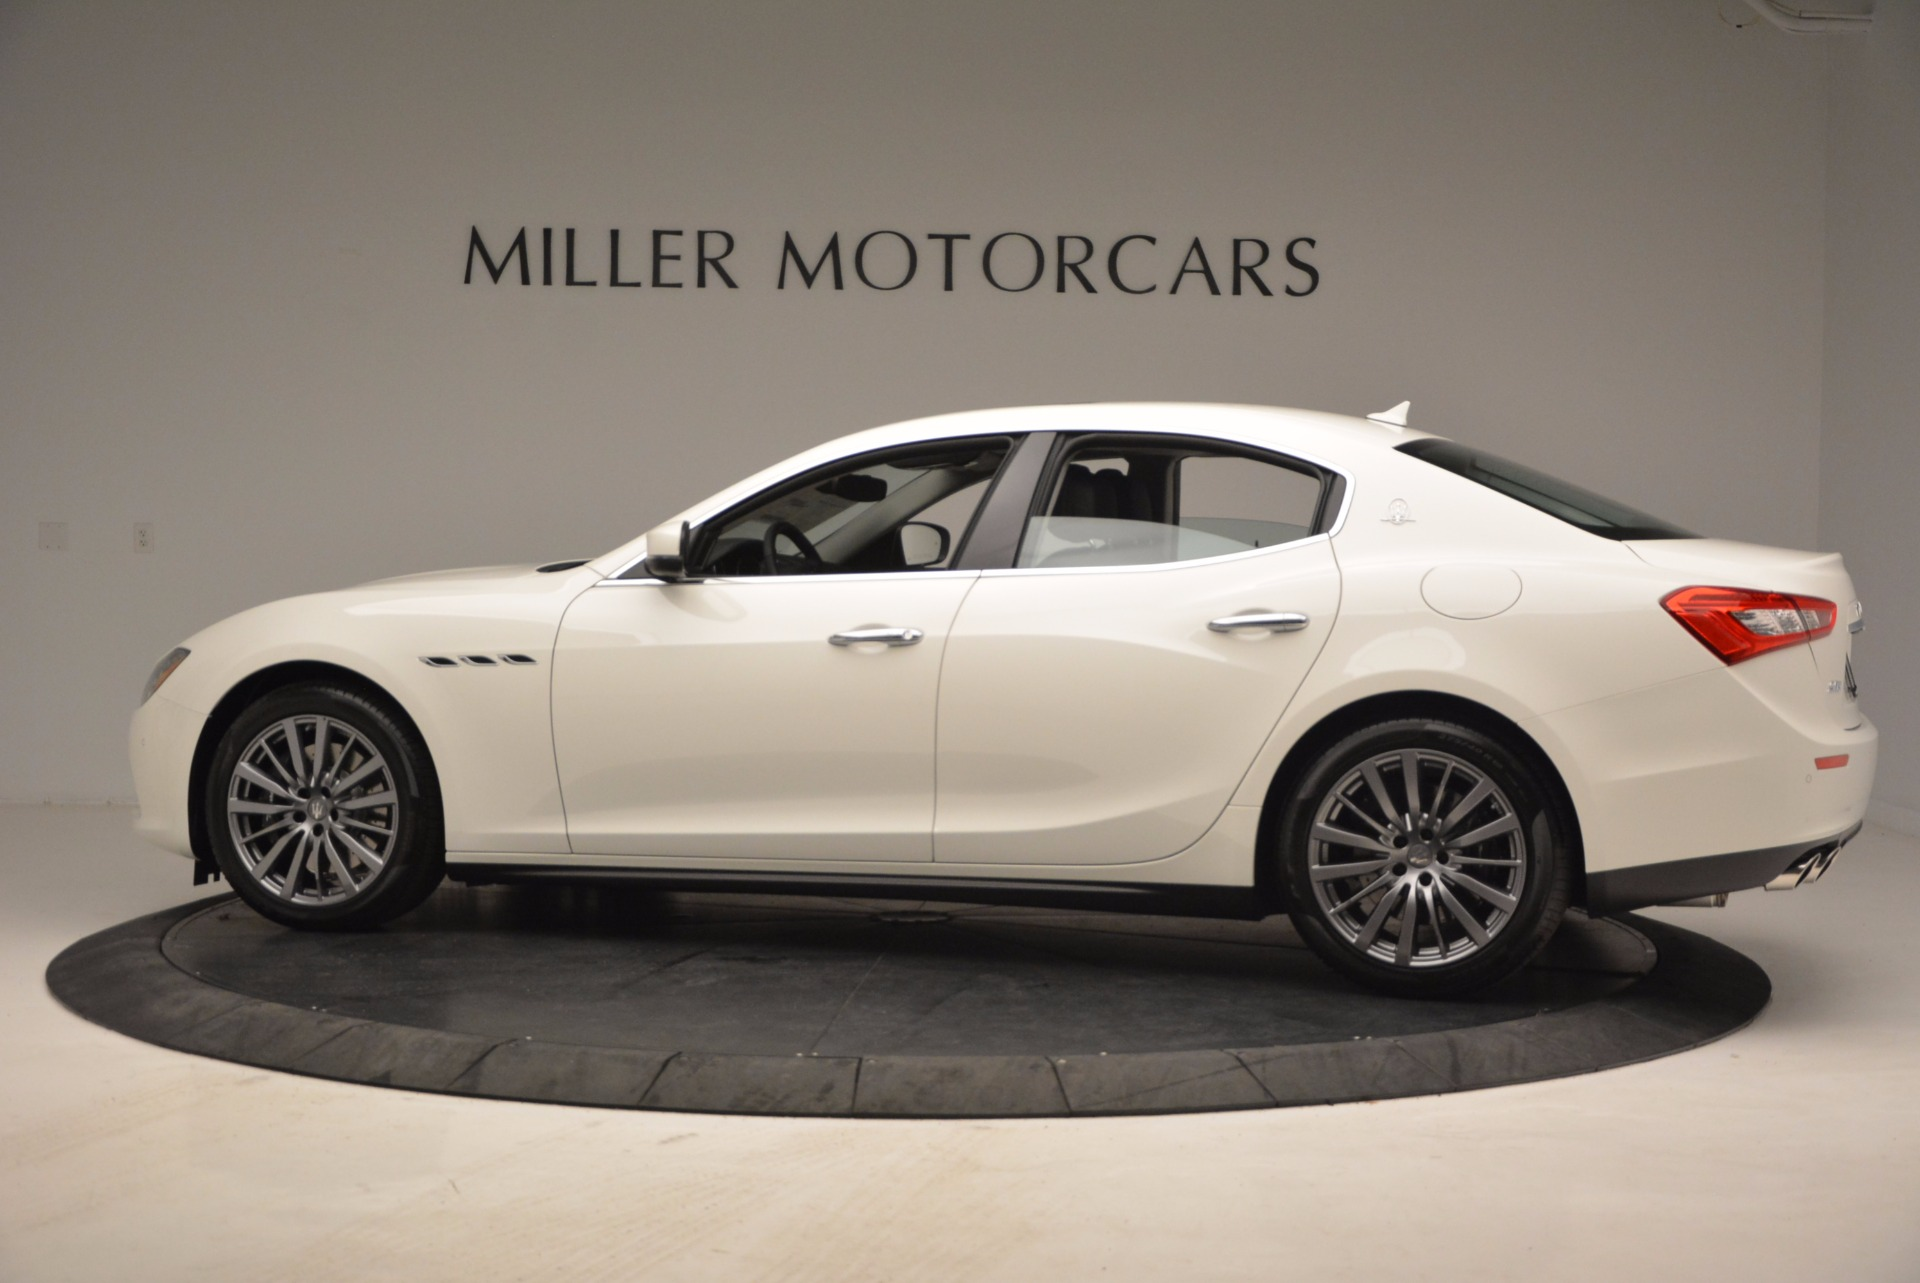 New 2017 Maserati Ghibli S Q4 EX-Loaner For Sale In Westport, CT 1031_p4